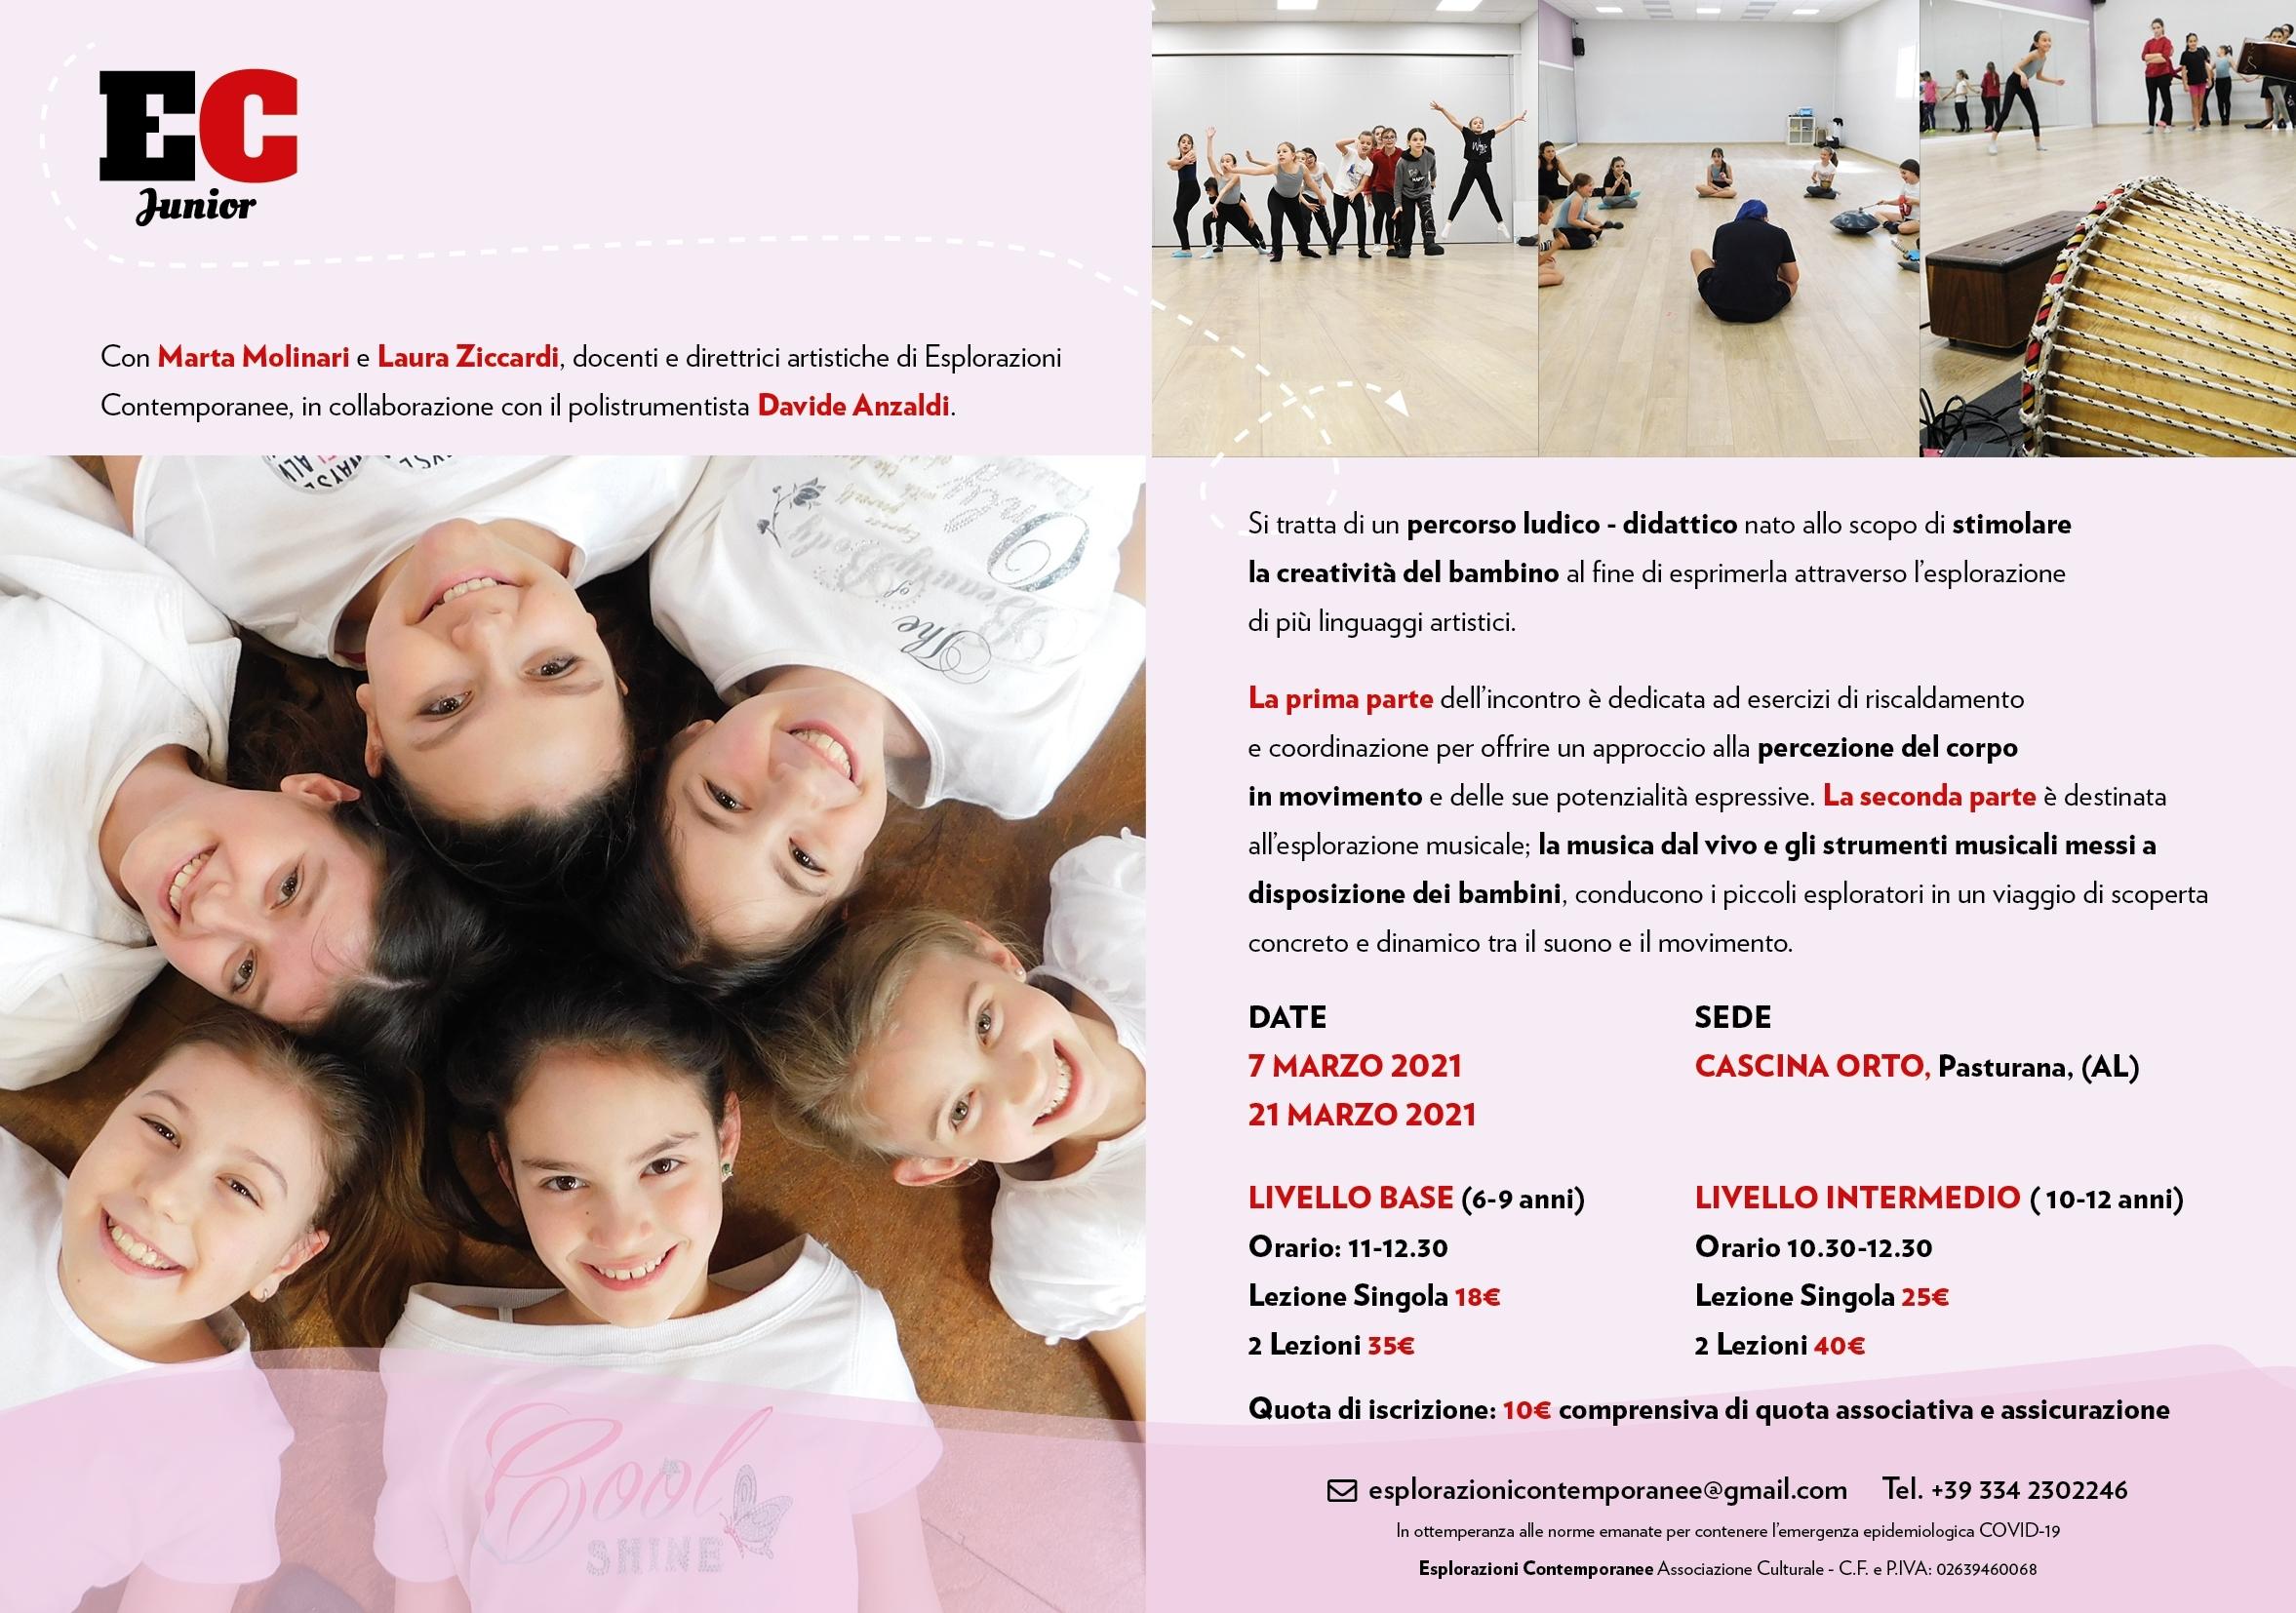 EC Junior programma febbraio2021 Cascina Orto